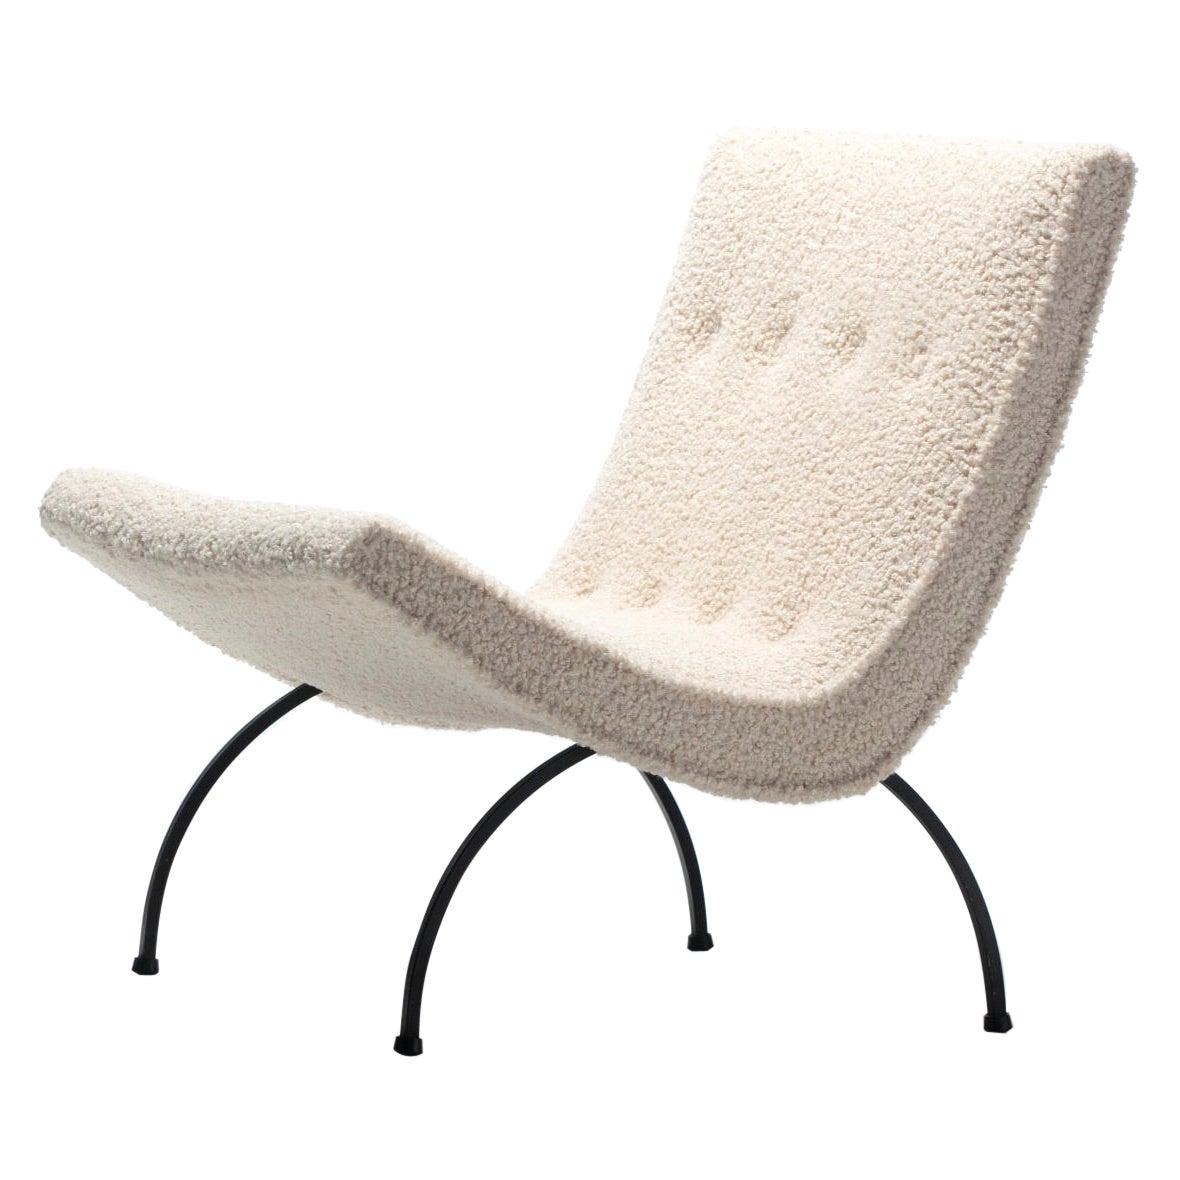 Milo Baughman Scoop Chair in Super Soft Ivory Bouclé with Iron Legs c. 1950s